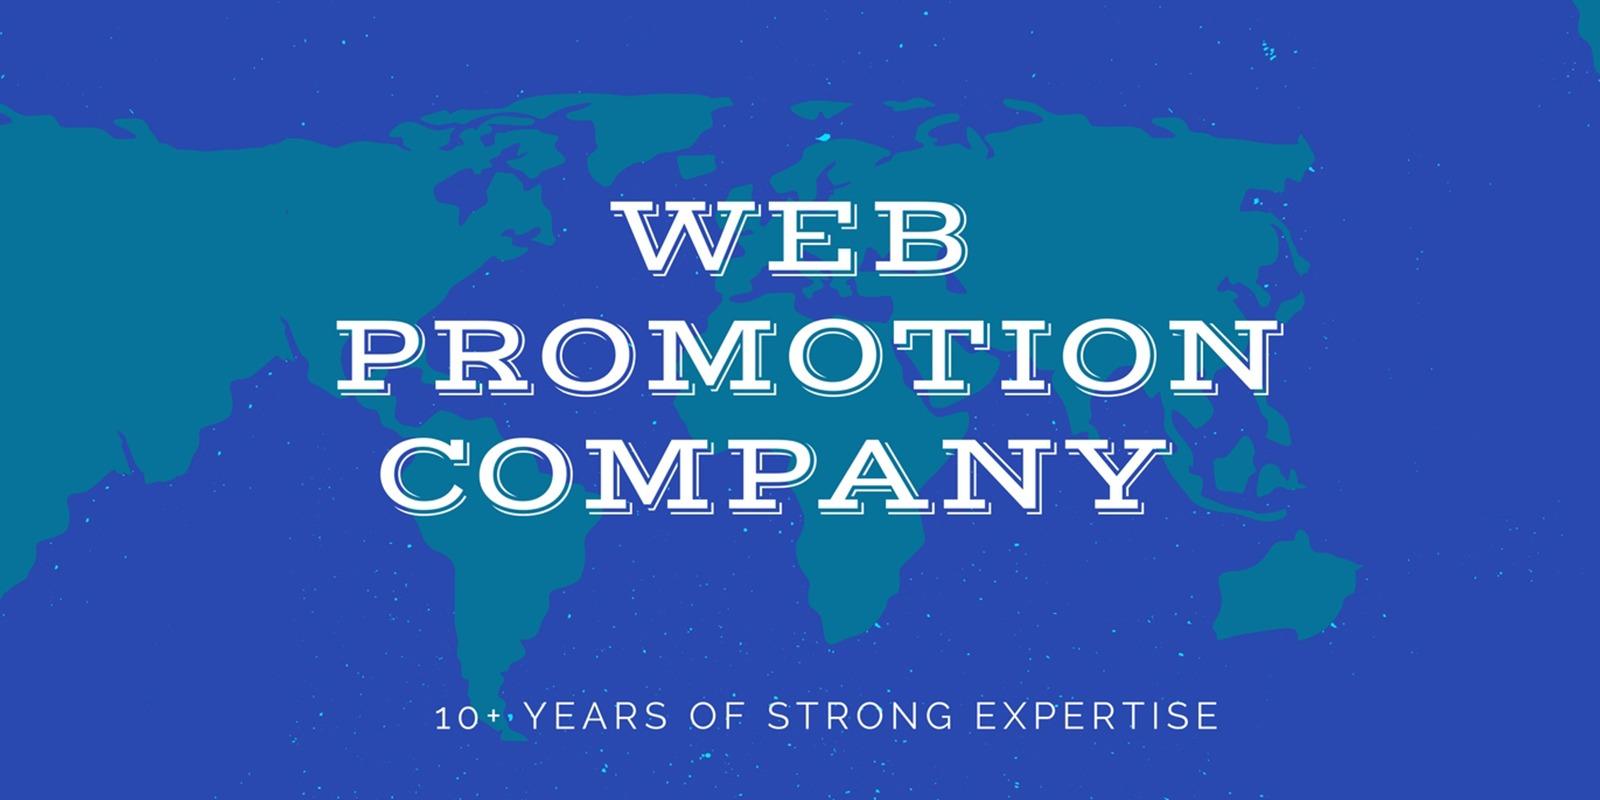 Website Promotion Company in Atlanta, Georgia, USA